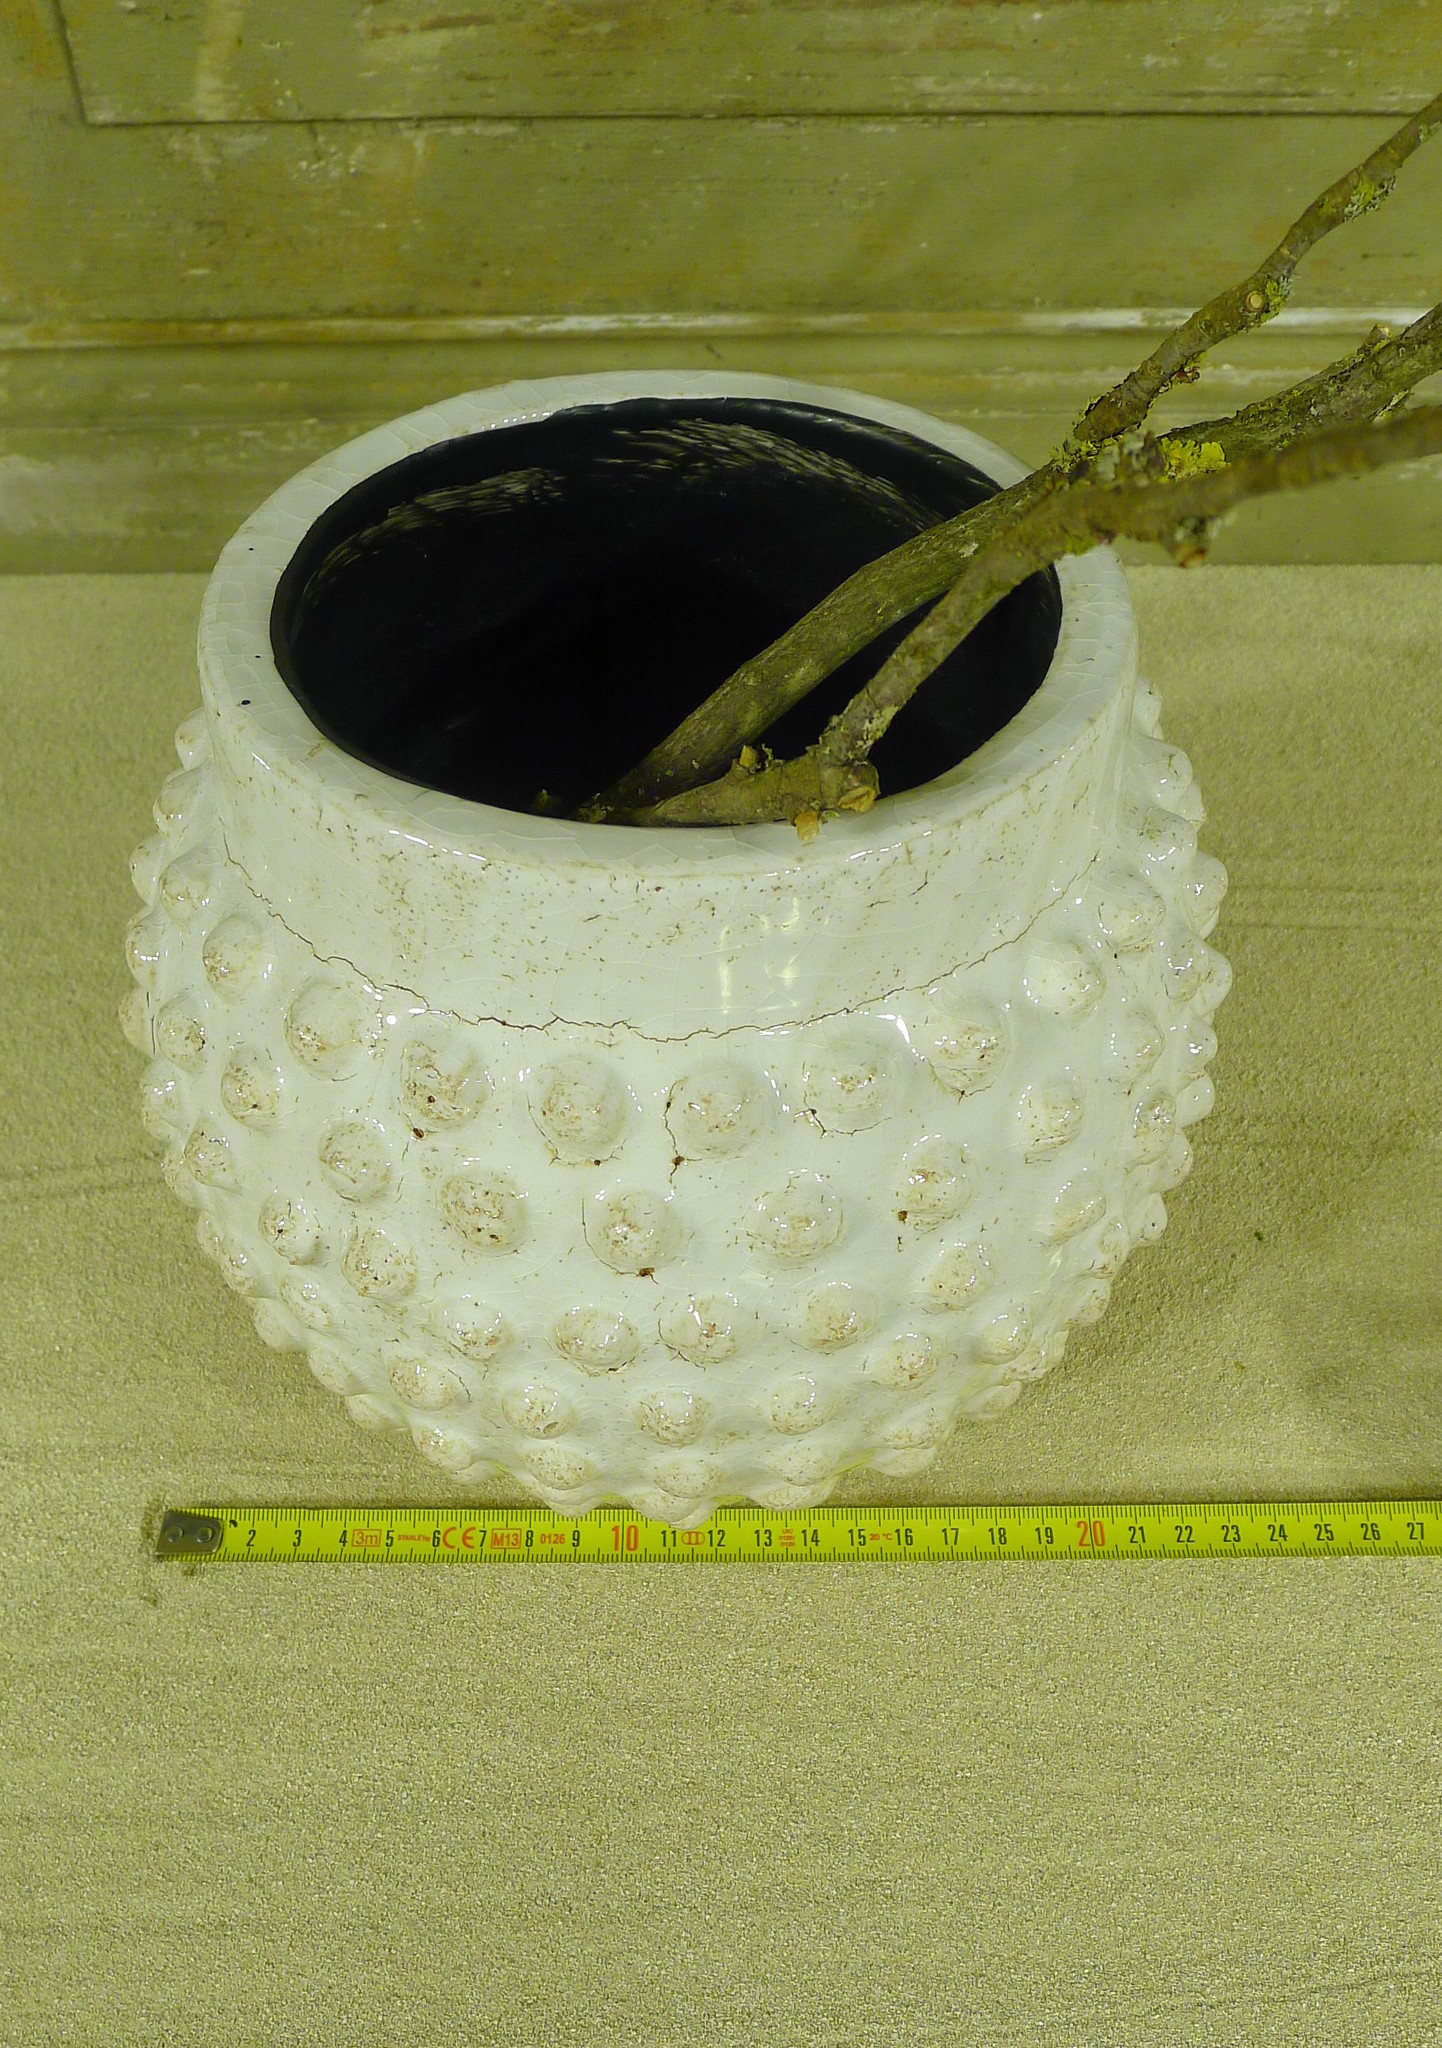 potceramicdot creme 21-5